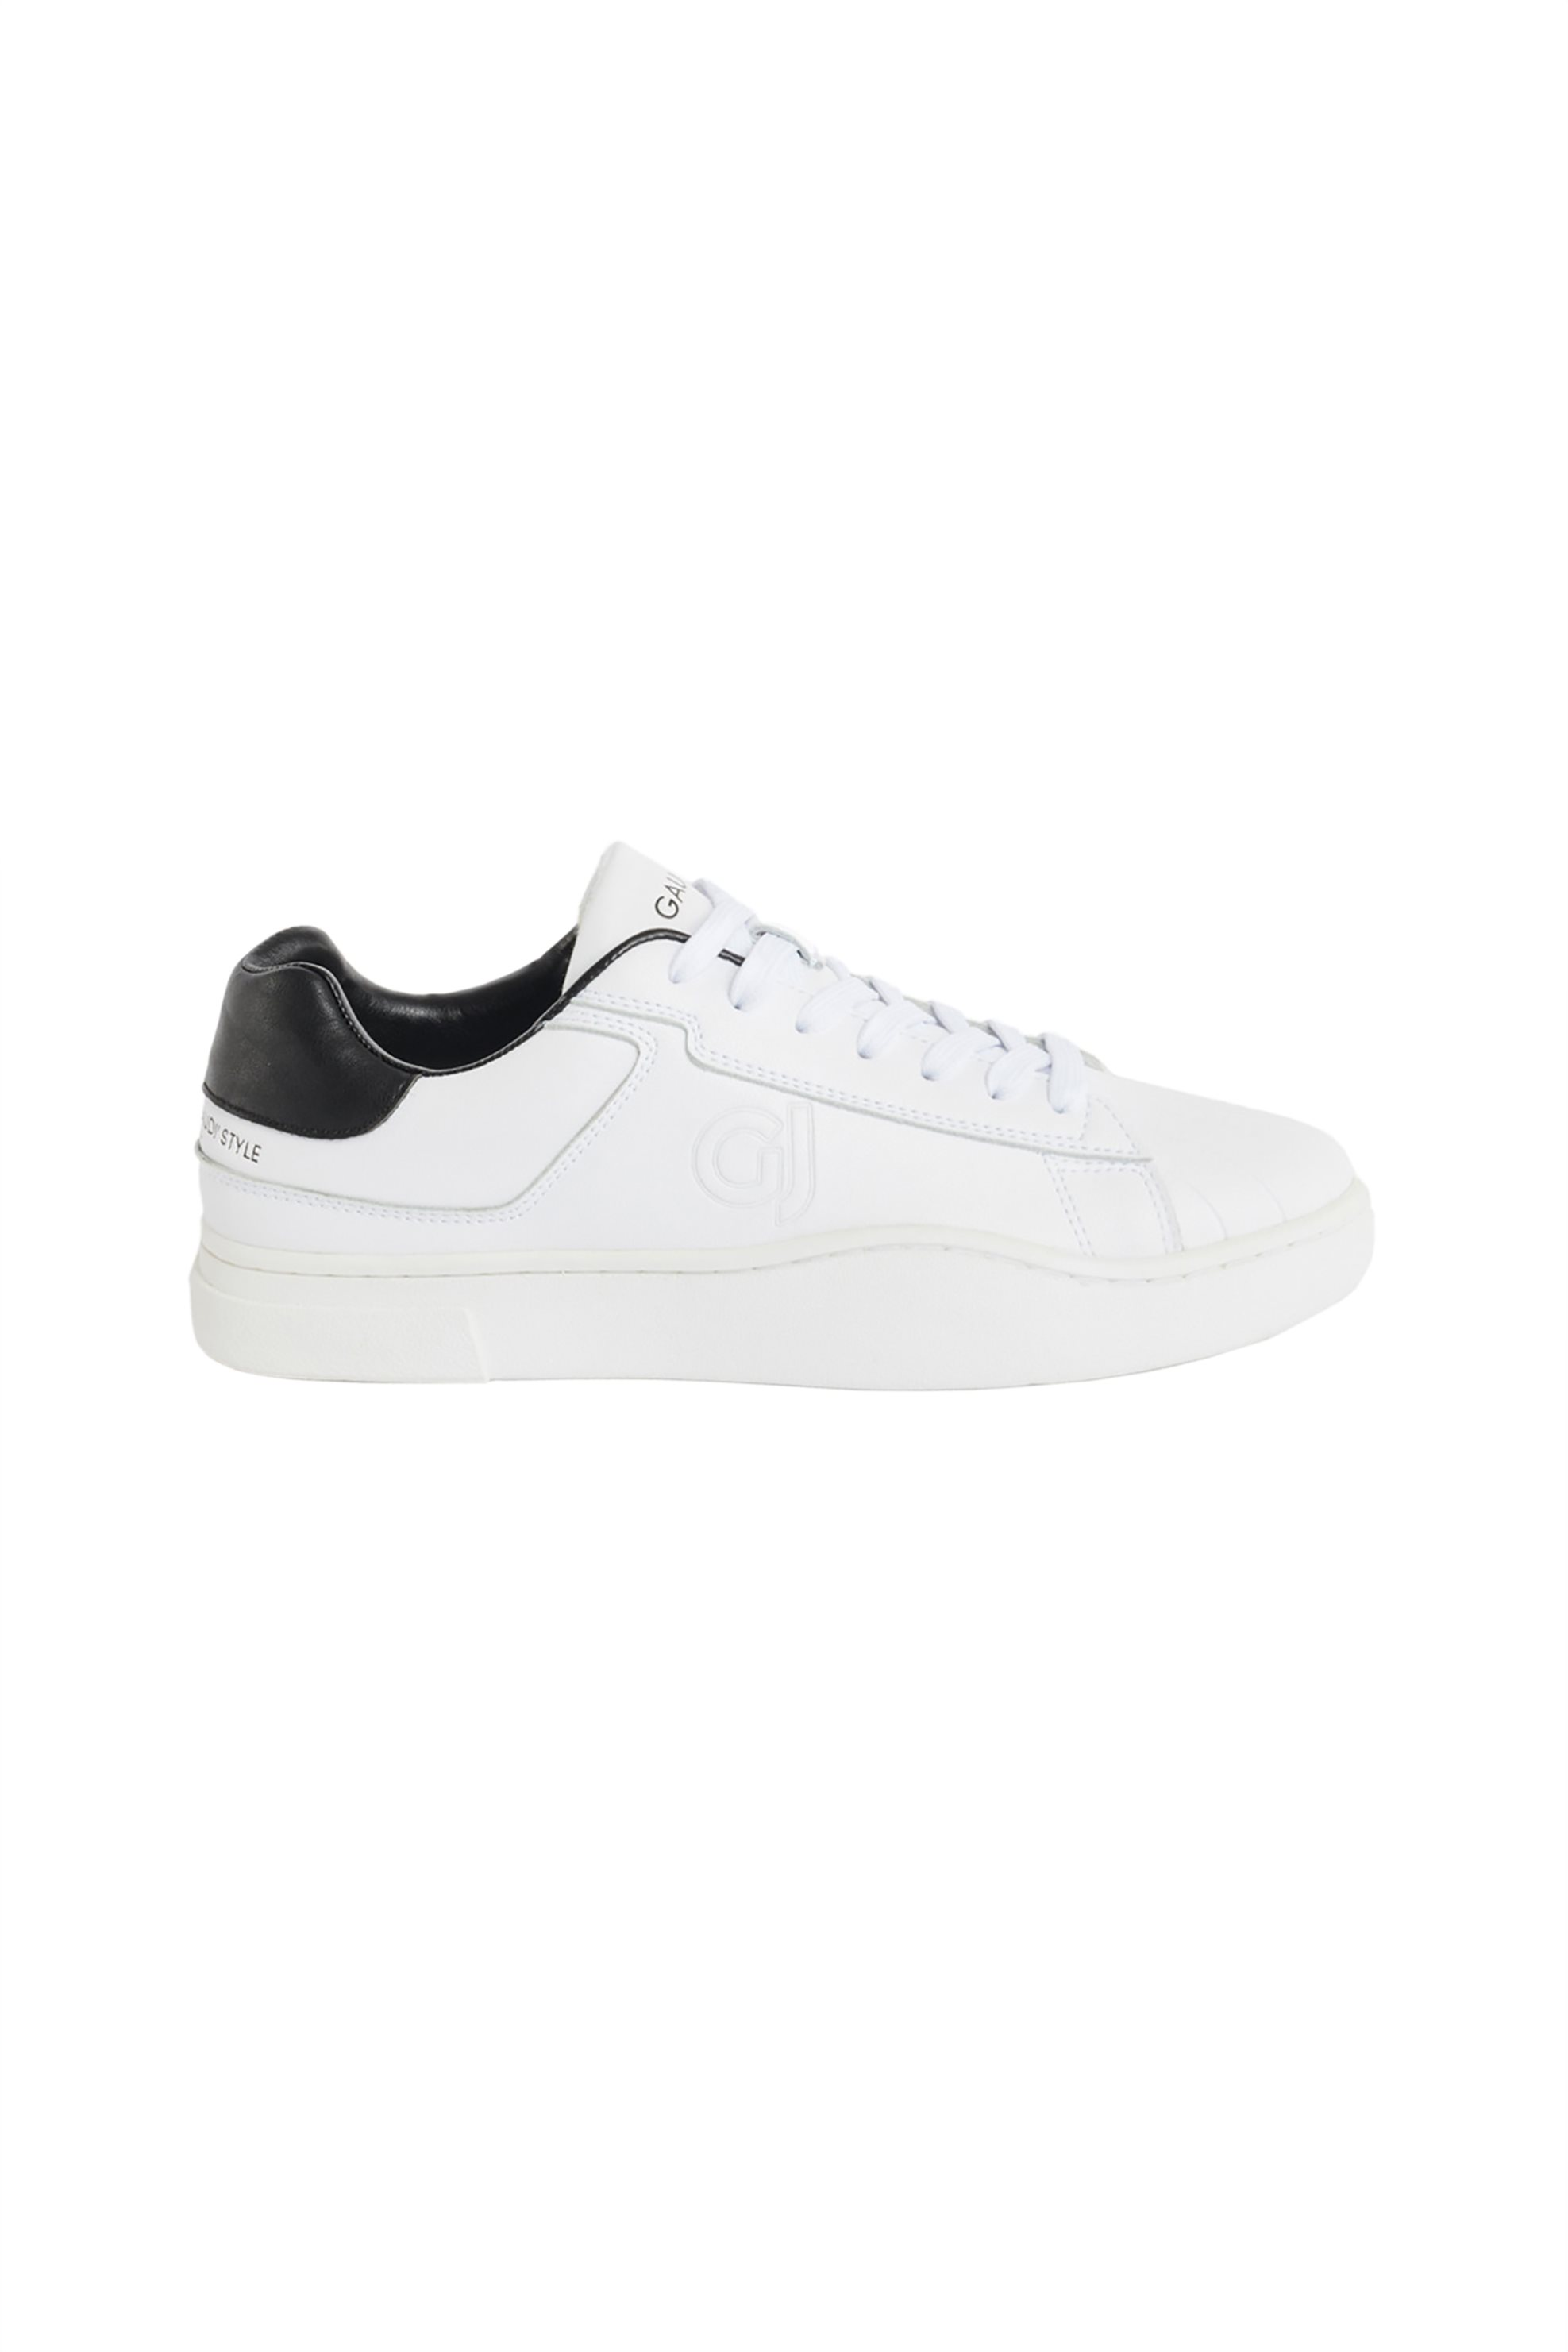 Gaudi ανδρικά sneakers με ανάγλυφο λογότυπο – V11-61462 – Λευκό